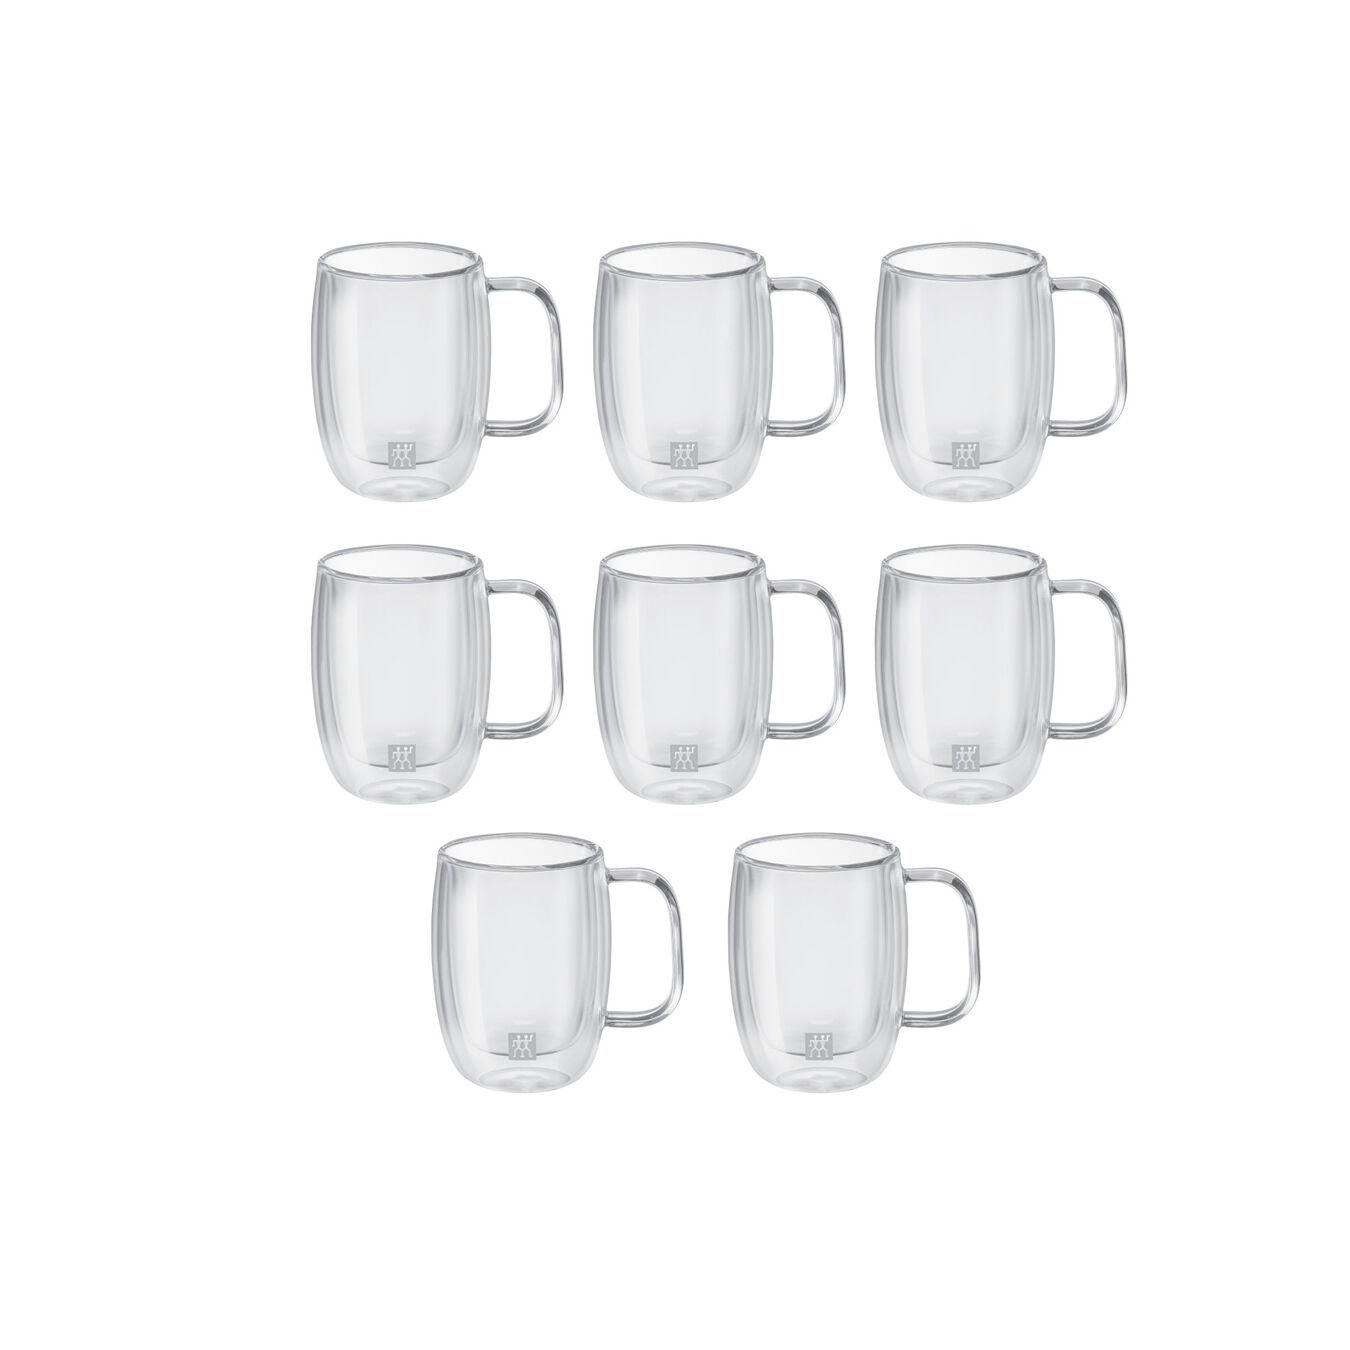 8 Piece Double Espresso Mug Set - Value Pack,,large 3